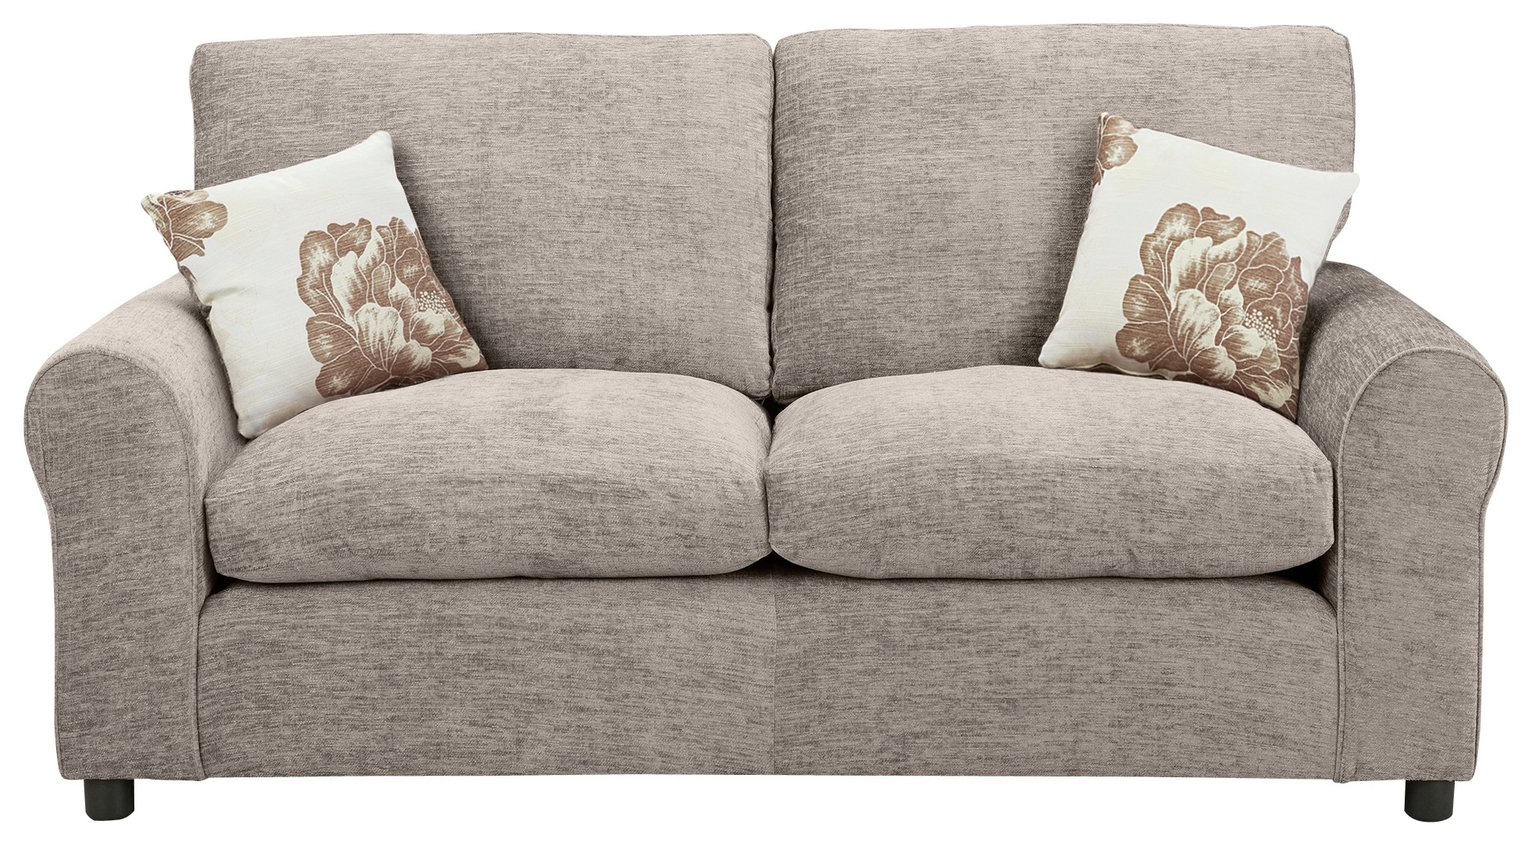 argos home tessa 2 seater fabric sofa bed mink 4240677. Black Bedroom Furniture Sets. Home Design Ideas